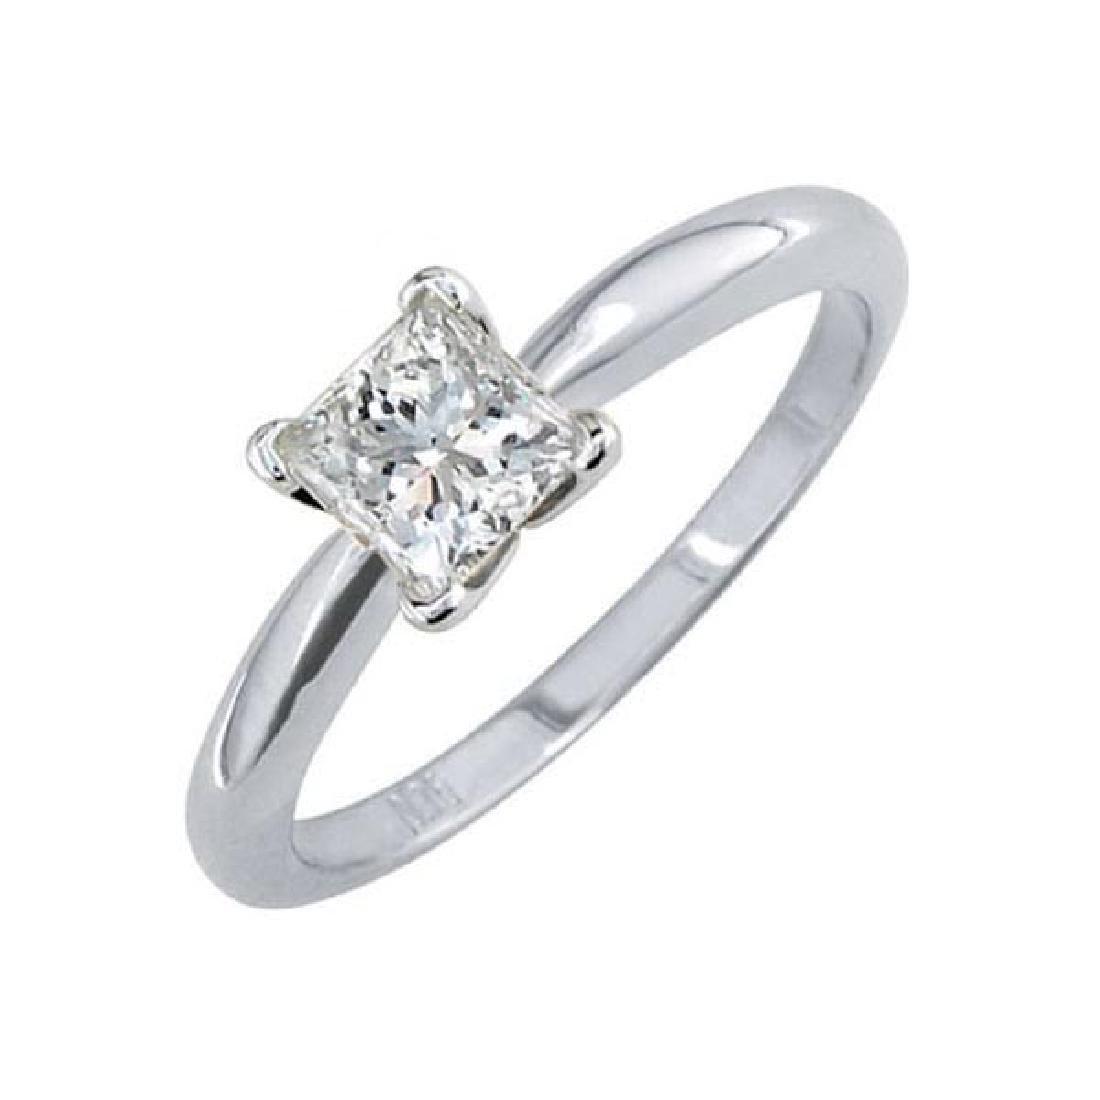 Certified 1.2 CTW Princess Diamond Solitaire 14k Ring G